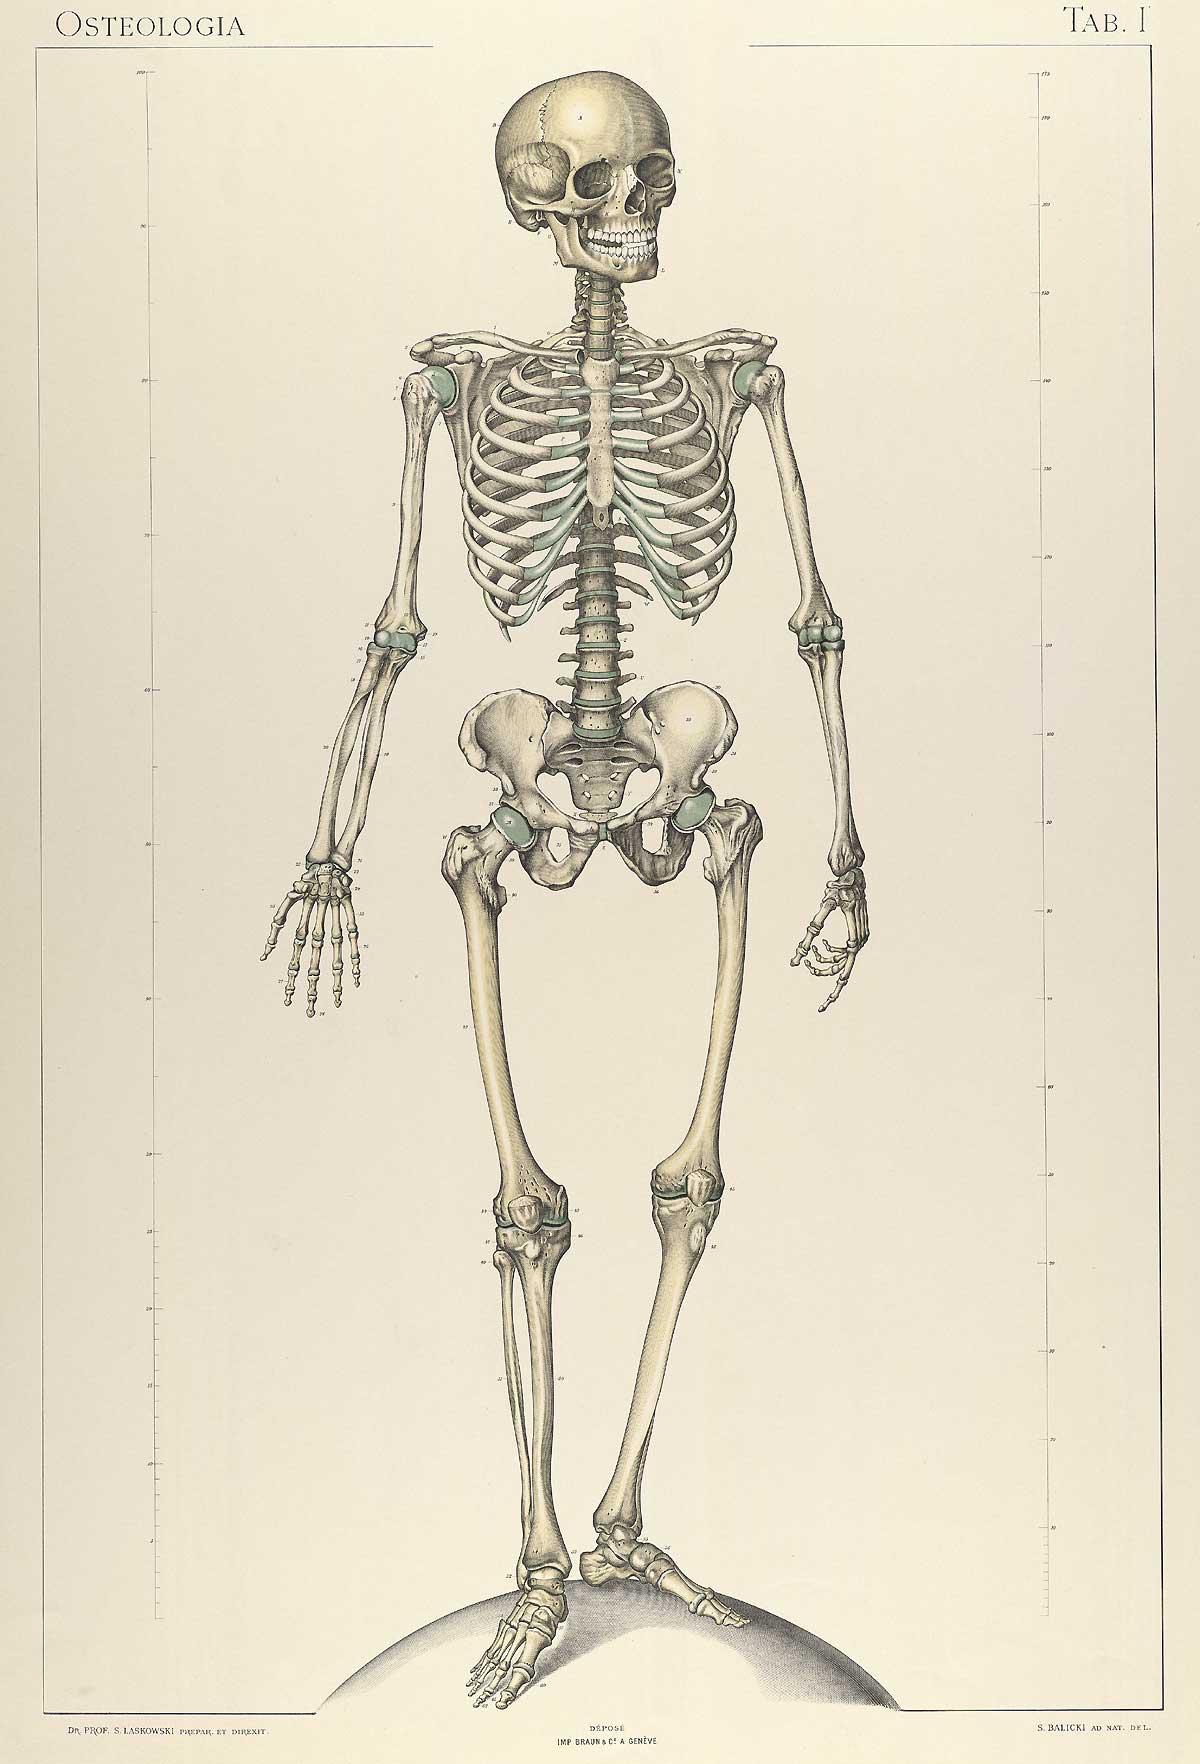 Anatomie Image historical anatomies on the web: sigismond laskowski home